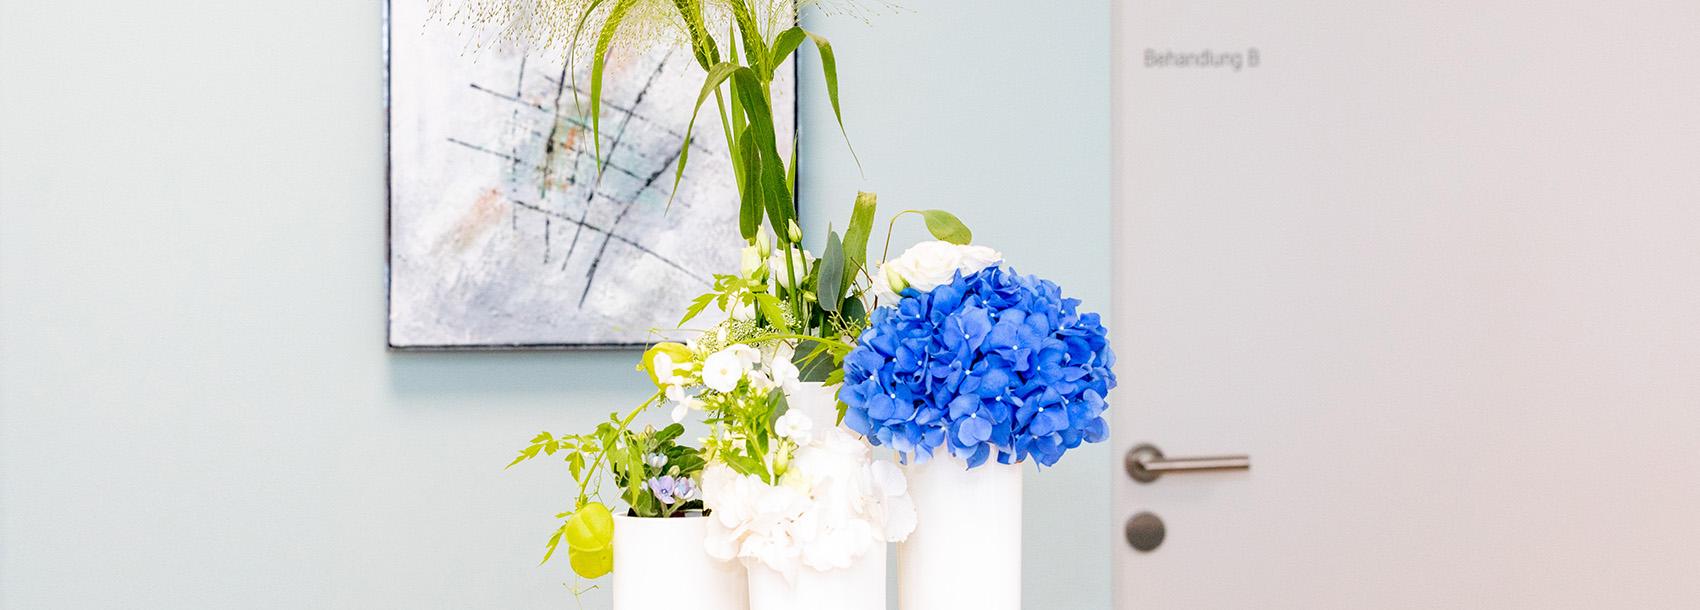 Praxis Gut – Blumen